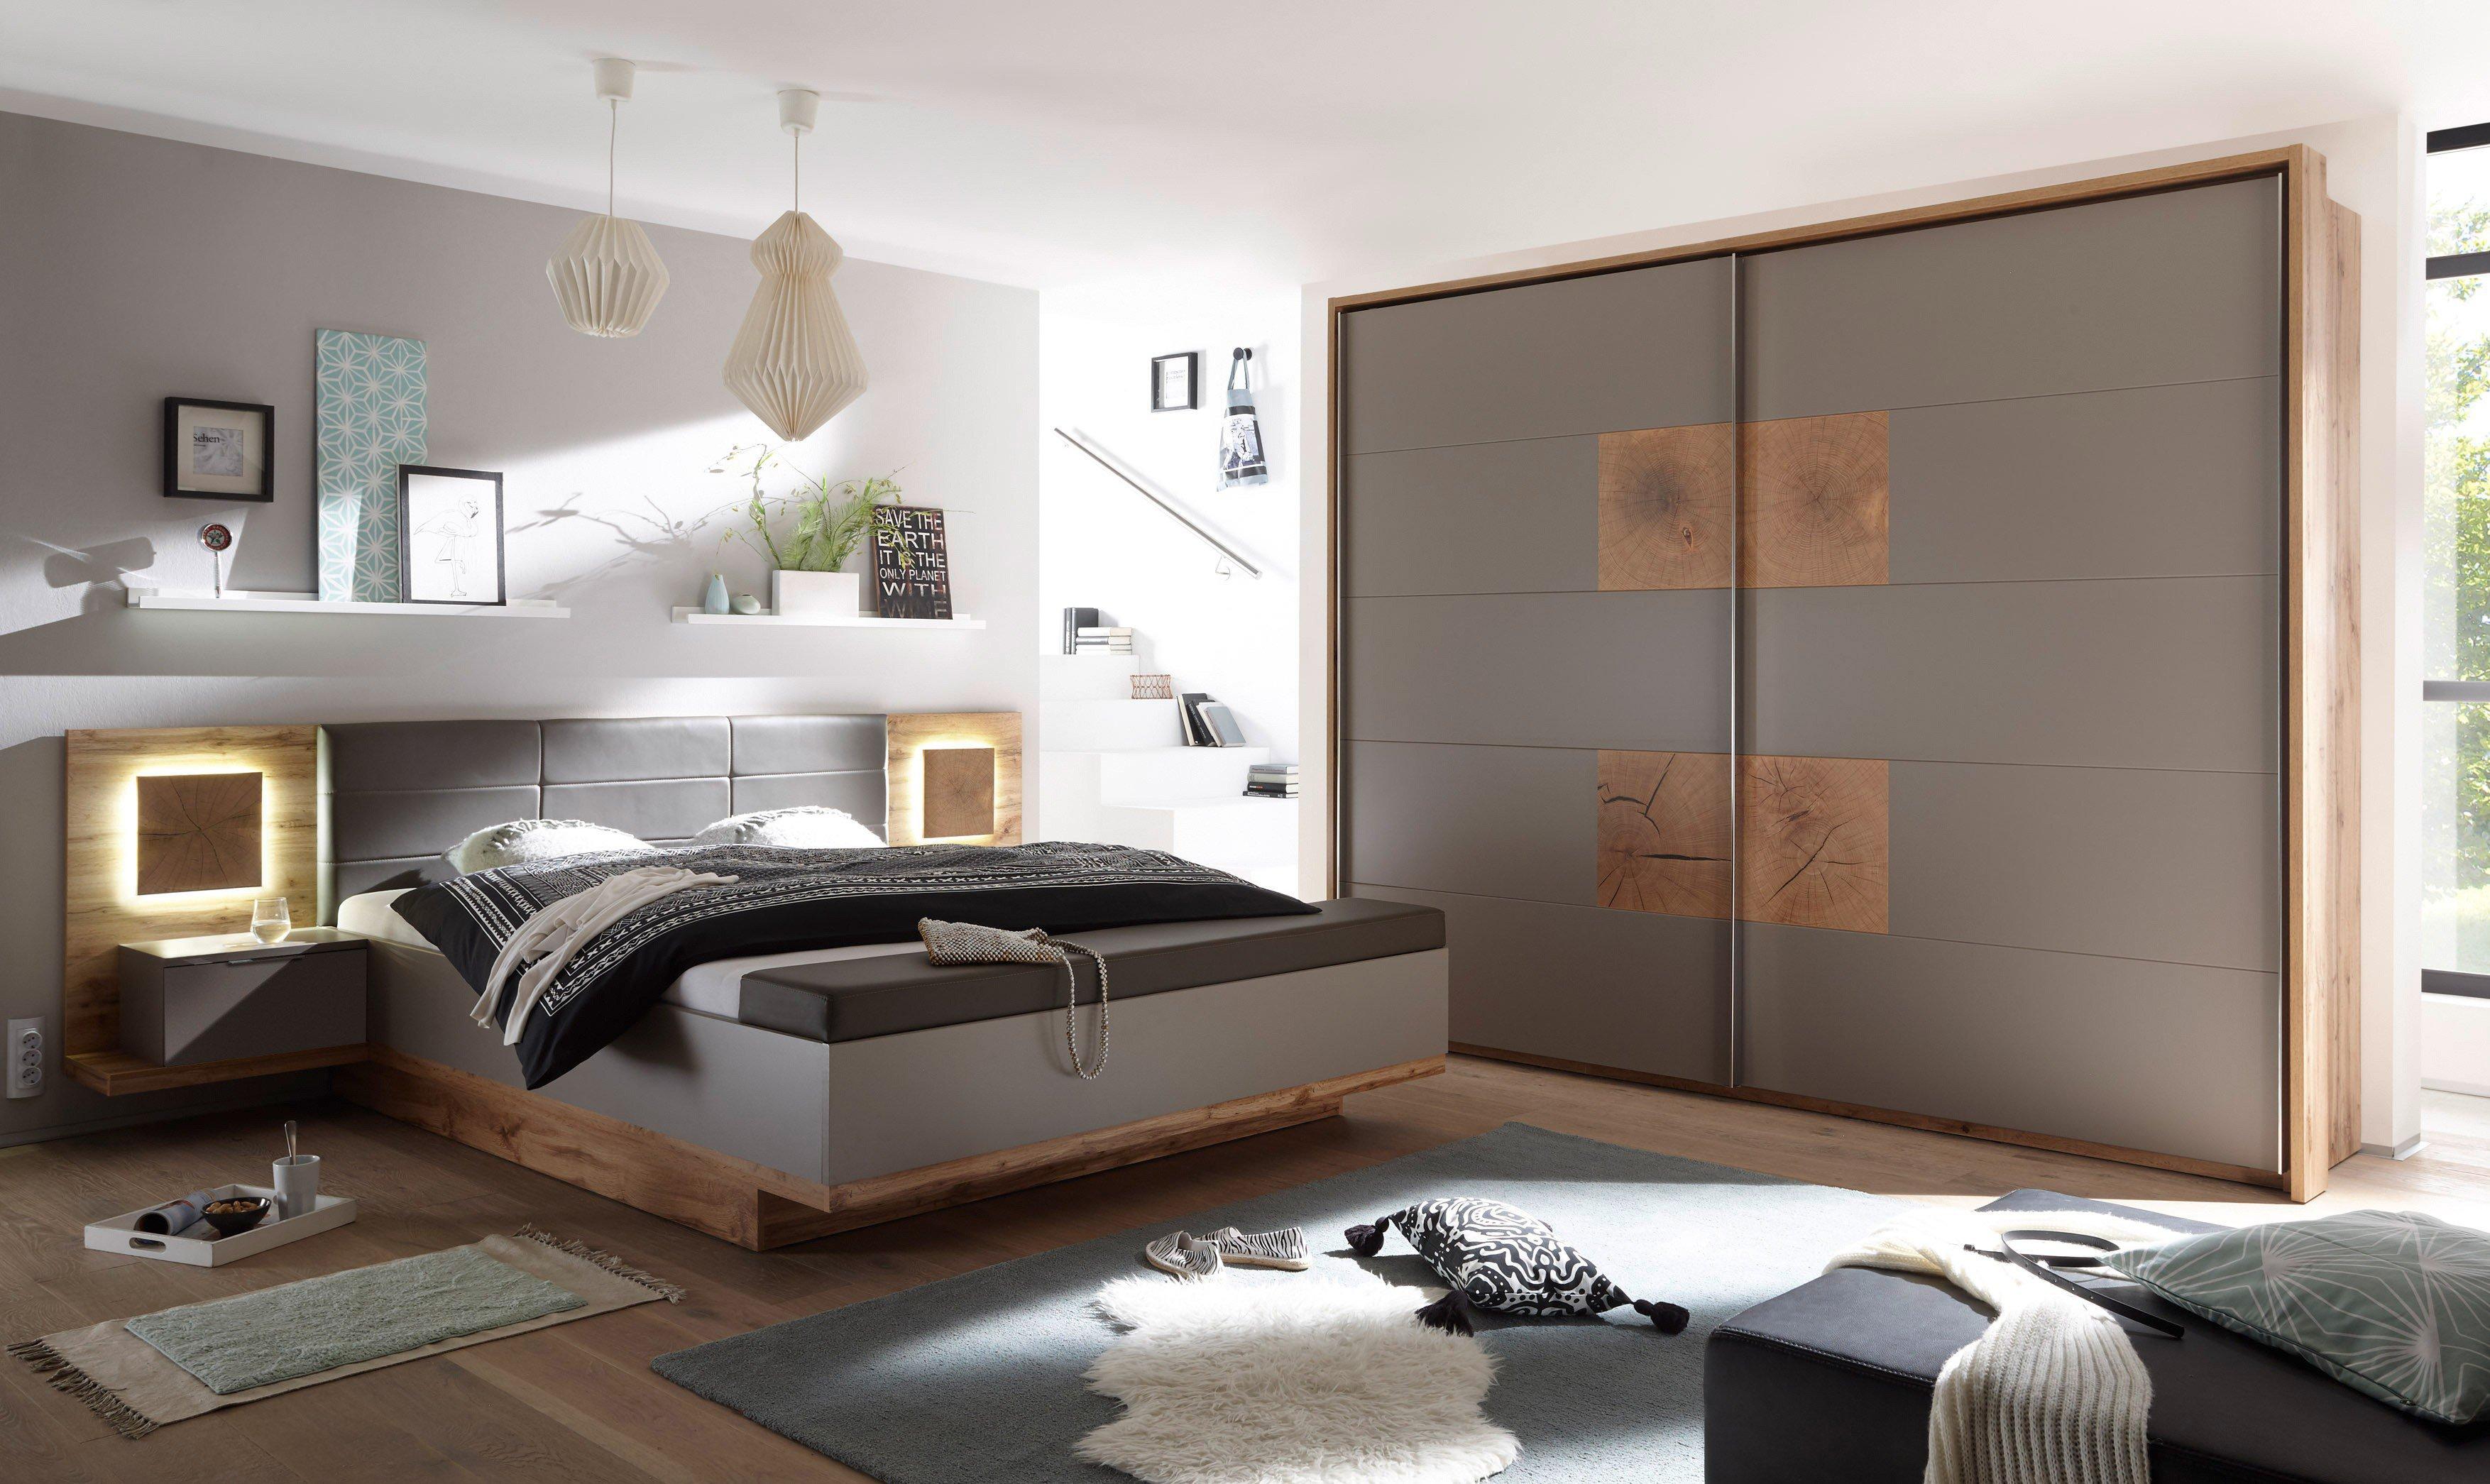 pol power schlafzimmer capri xl capri basalt m bel letz ihr online shop. Black Bedroom Furniture Sets. Home Design Ideas